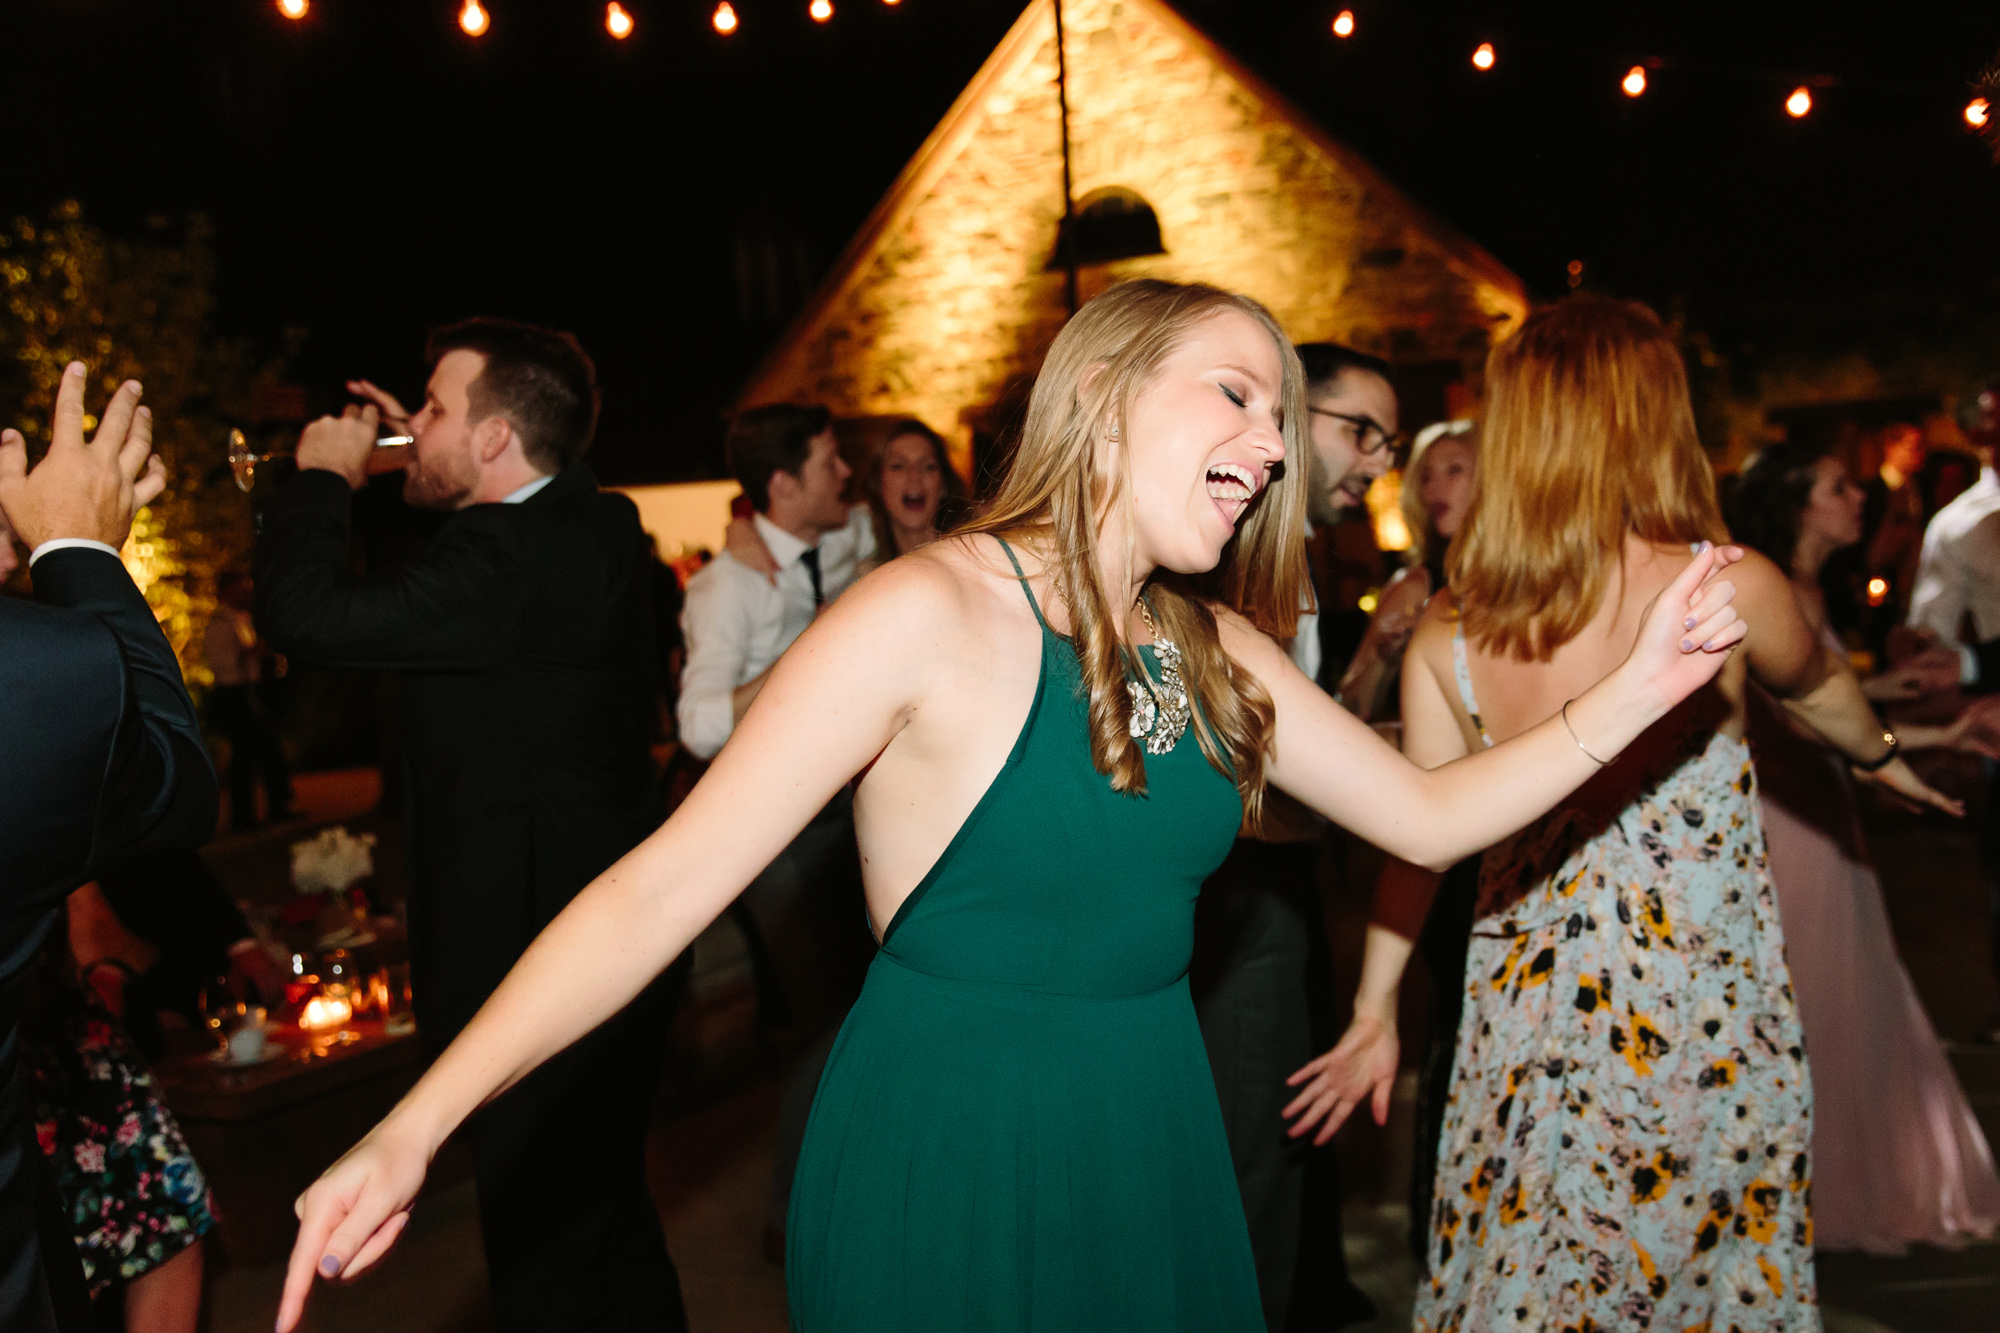 78_Jessica_Ted_Blue_Hill_Stone_Barns_Wedding_Pocantico_NY_Tanya_Salazar_Photography_204.jpg